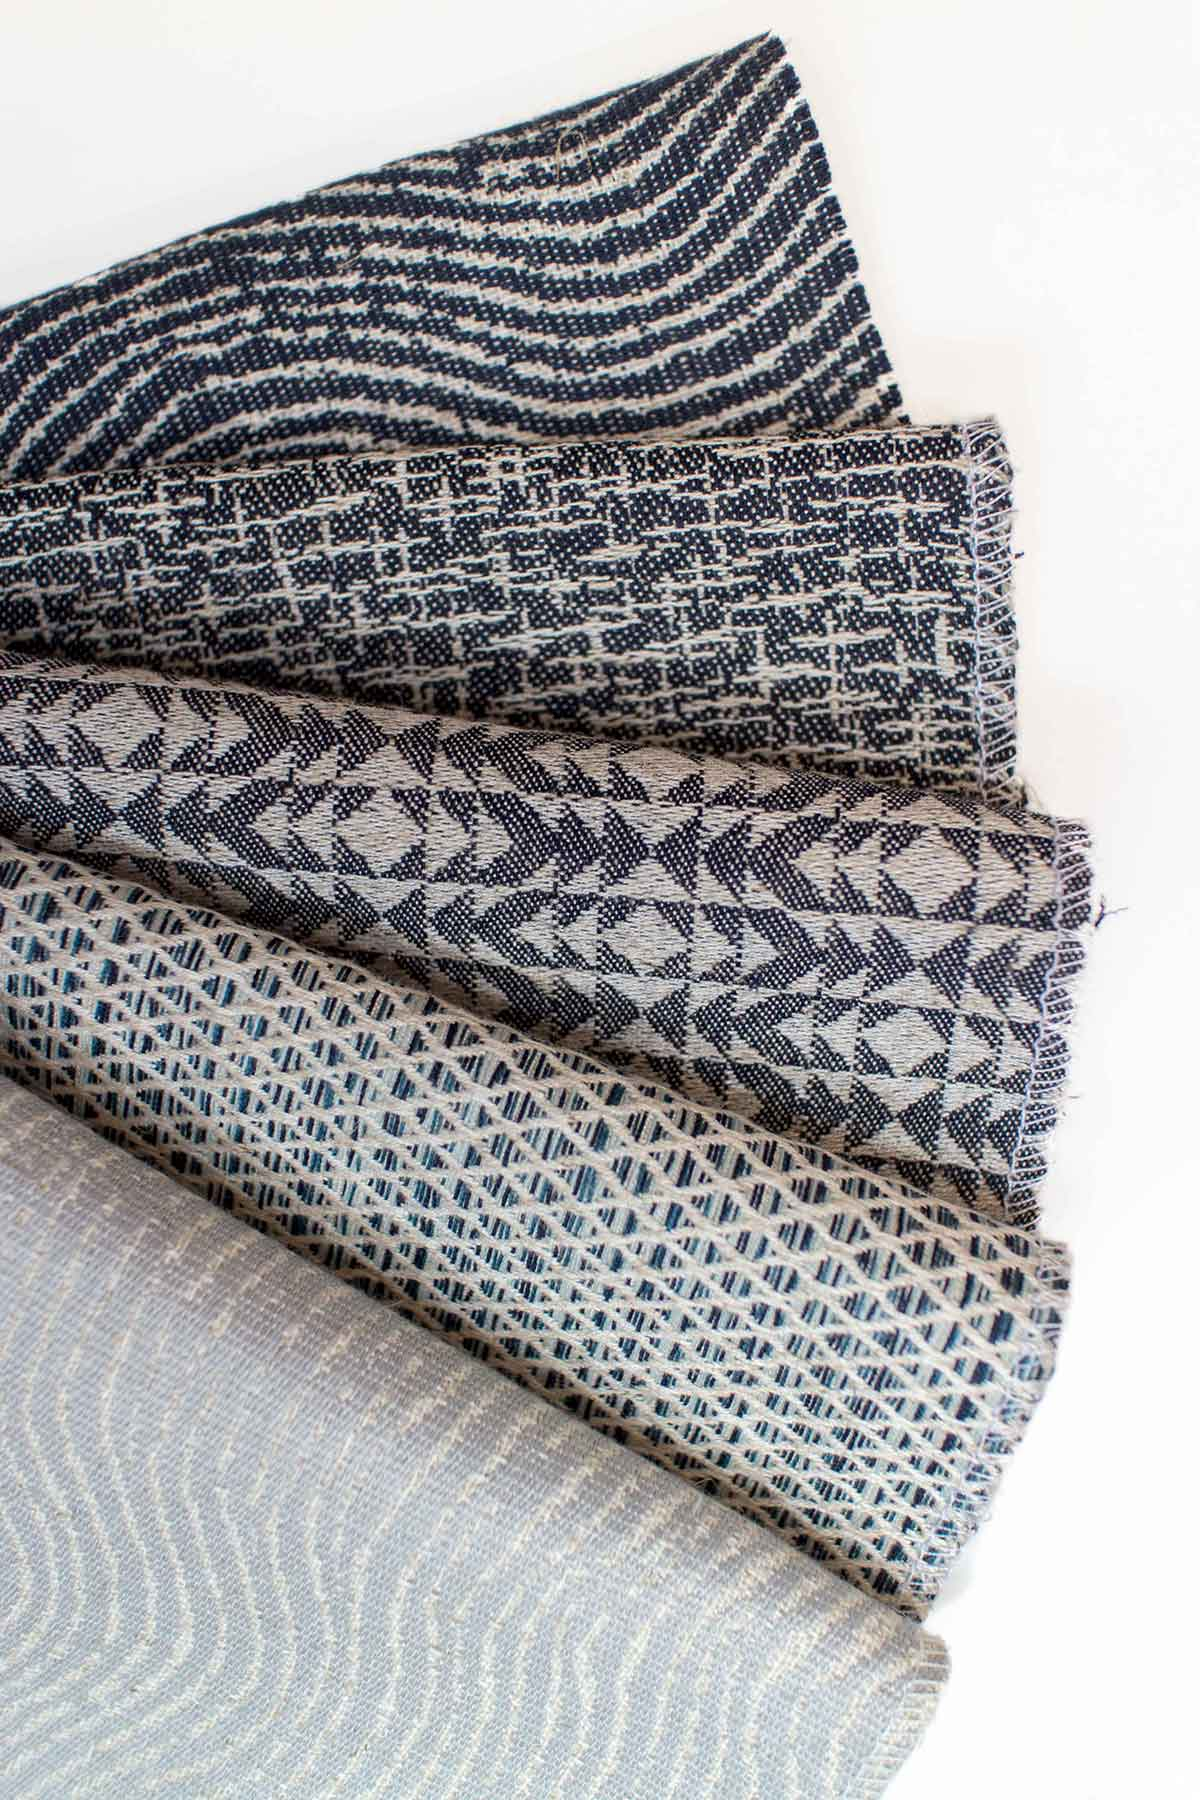 Fil-Doux-Textiles_Dialogue_17.jpg